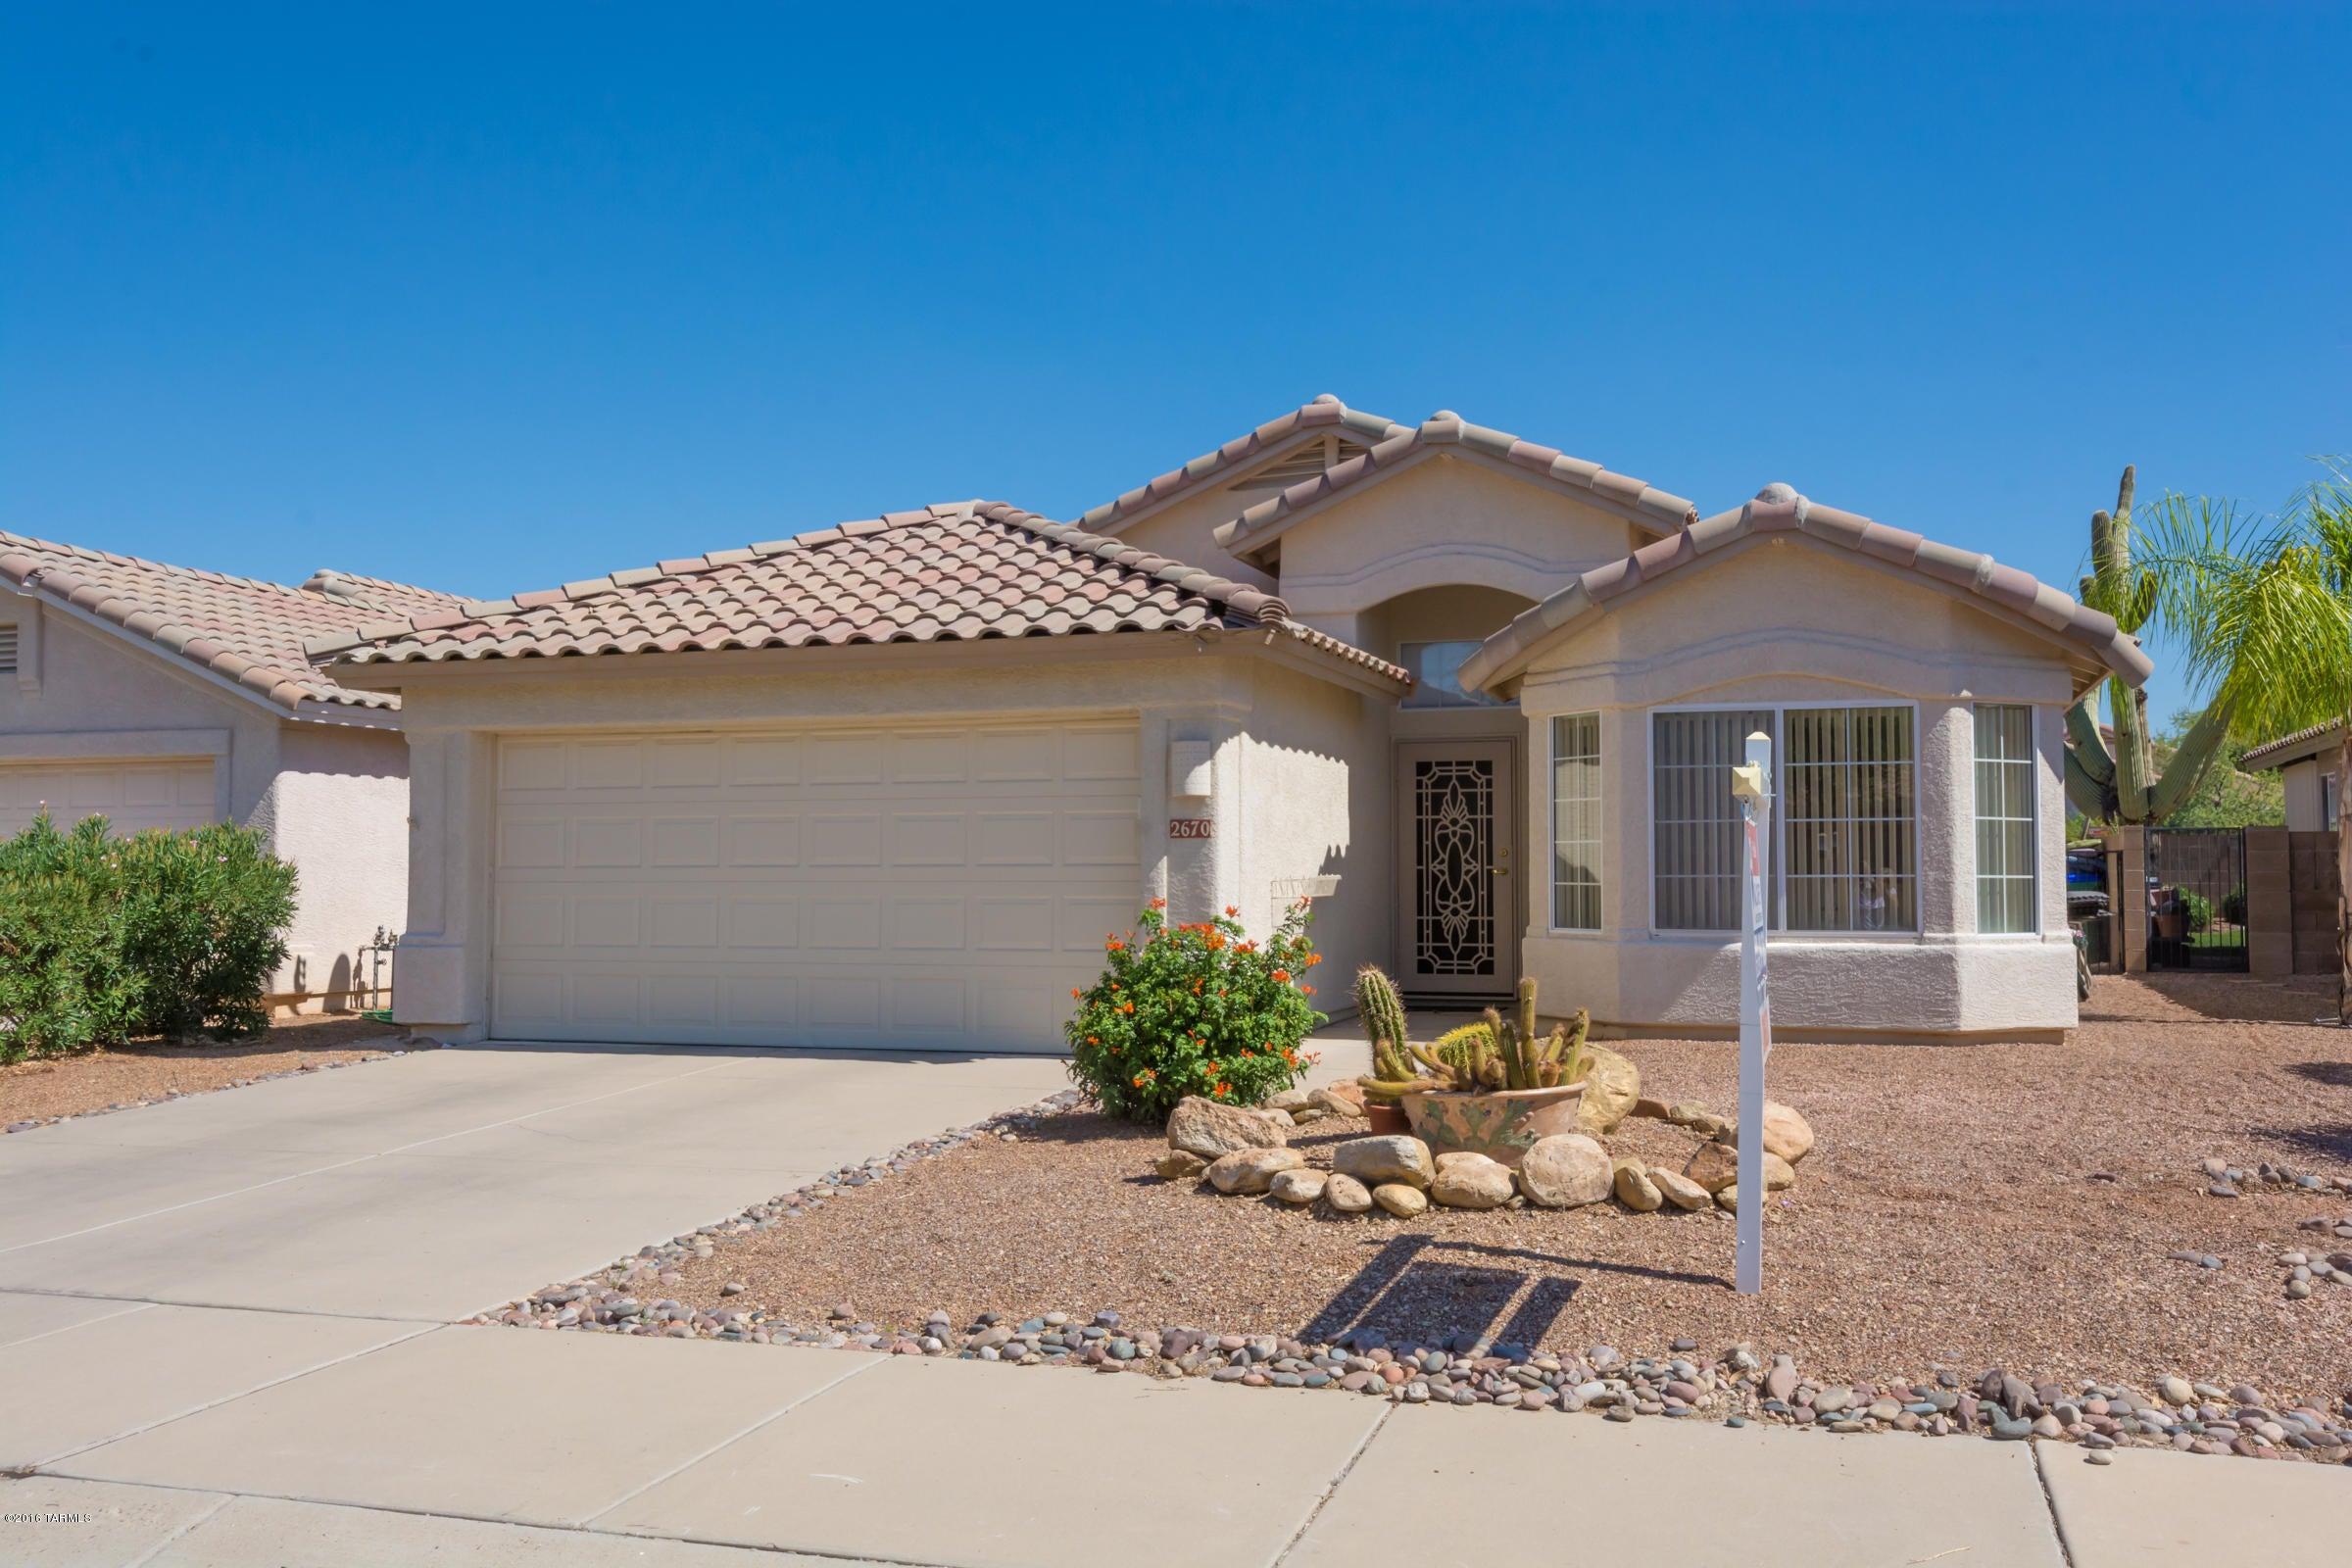 85742 homes for sale tucson az under 200 000 for Houses under 200000